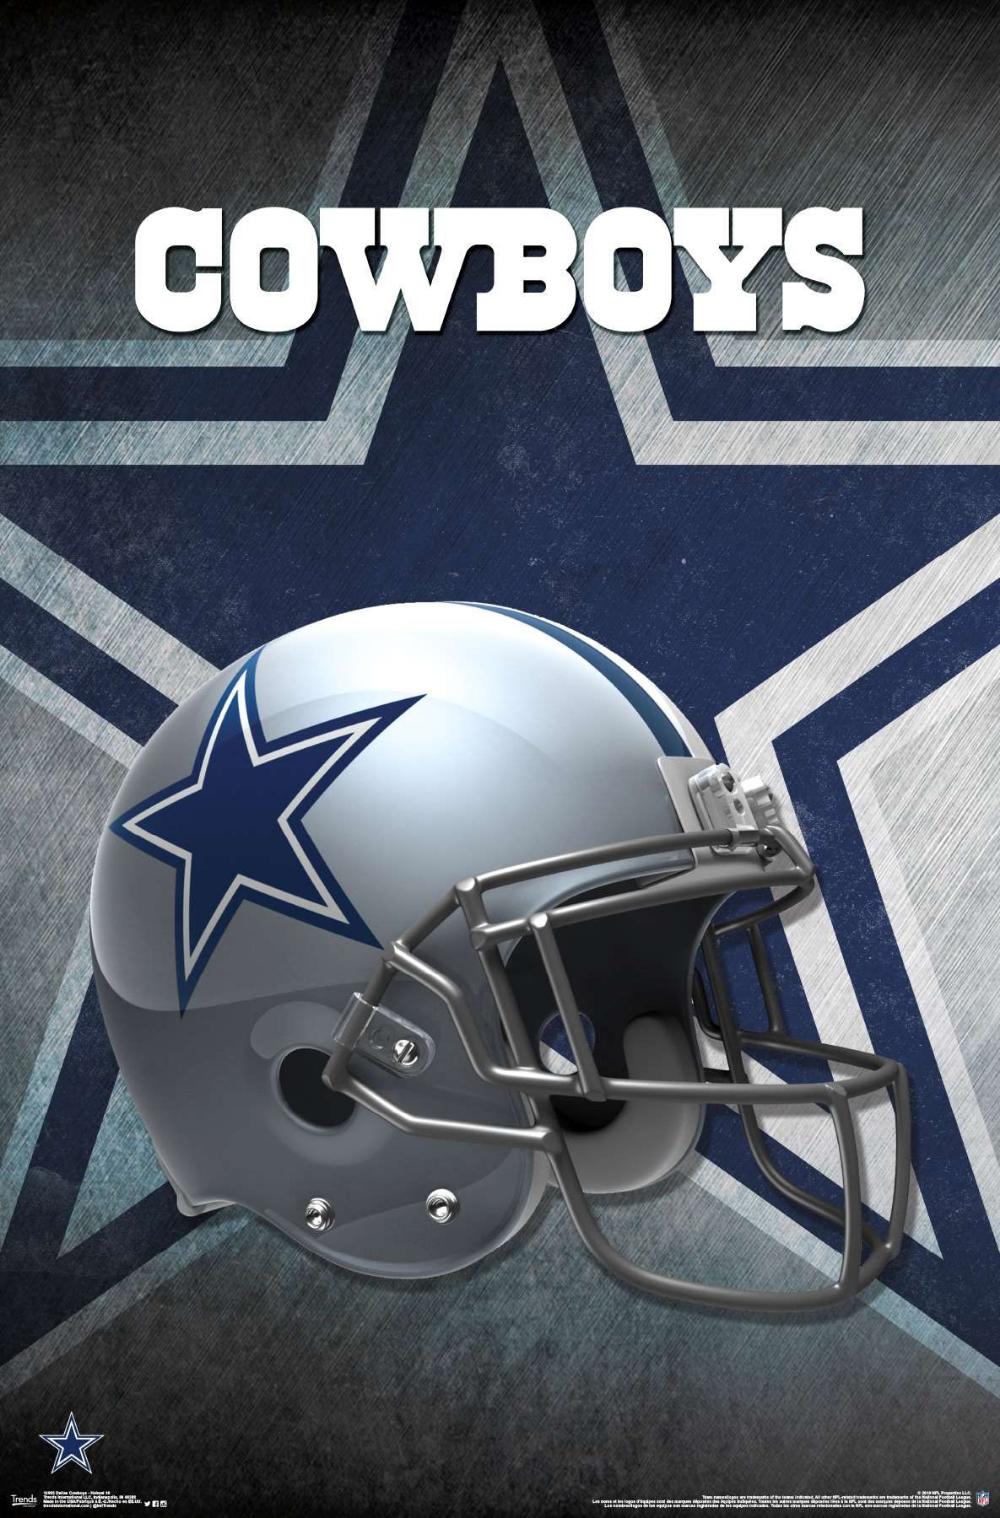 Nfl Dallas Cowboys Helmet 16 Cowboys Helmet Dallas Cowboys Posters Dallas Cowboys